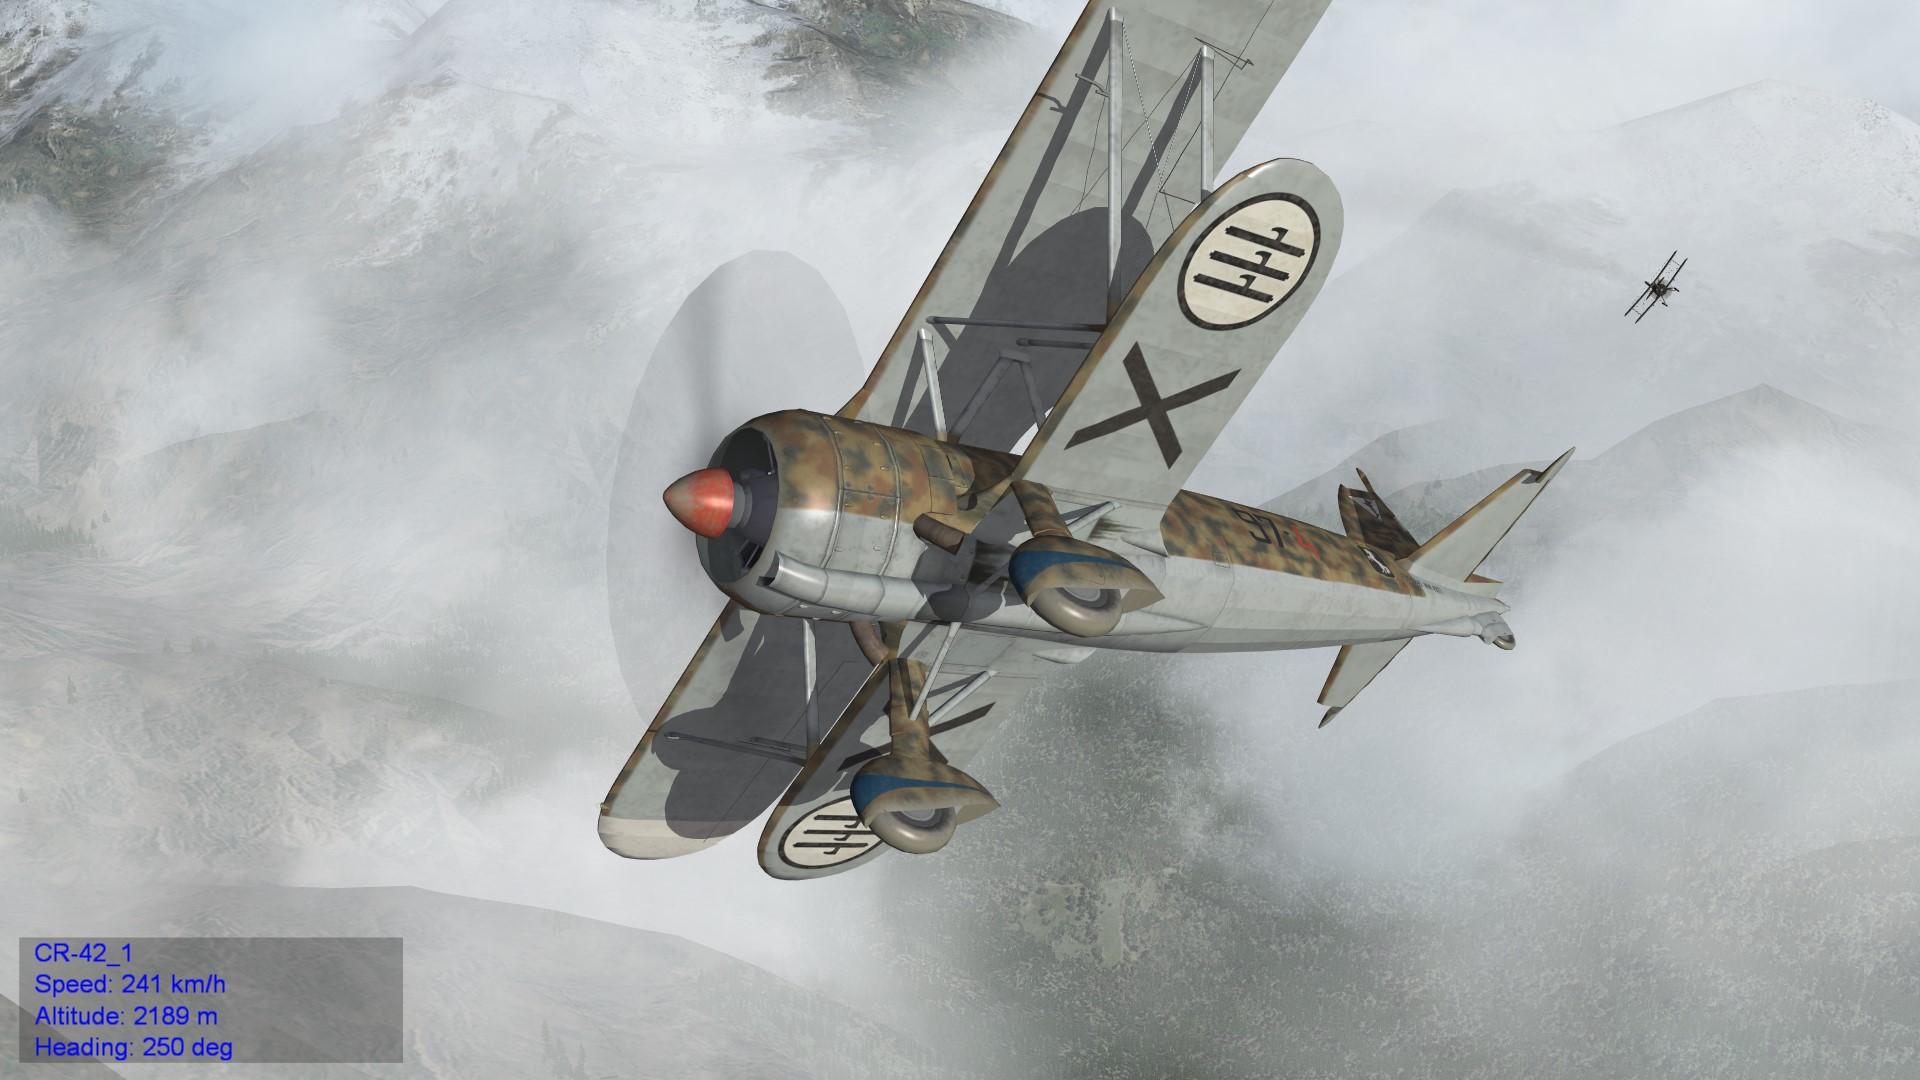 CR42 (1940)